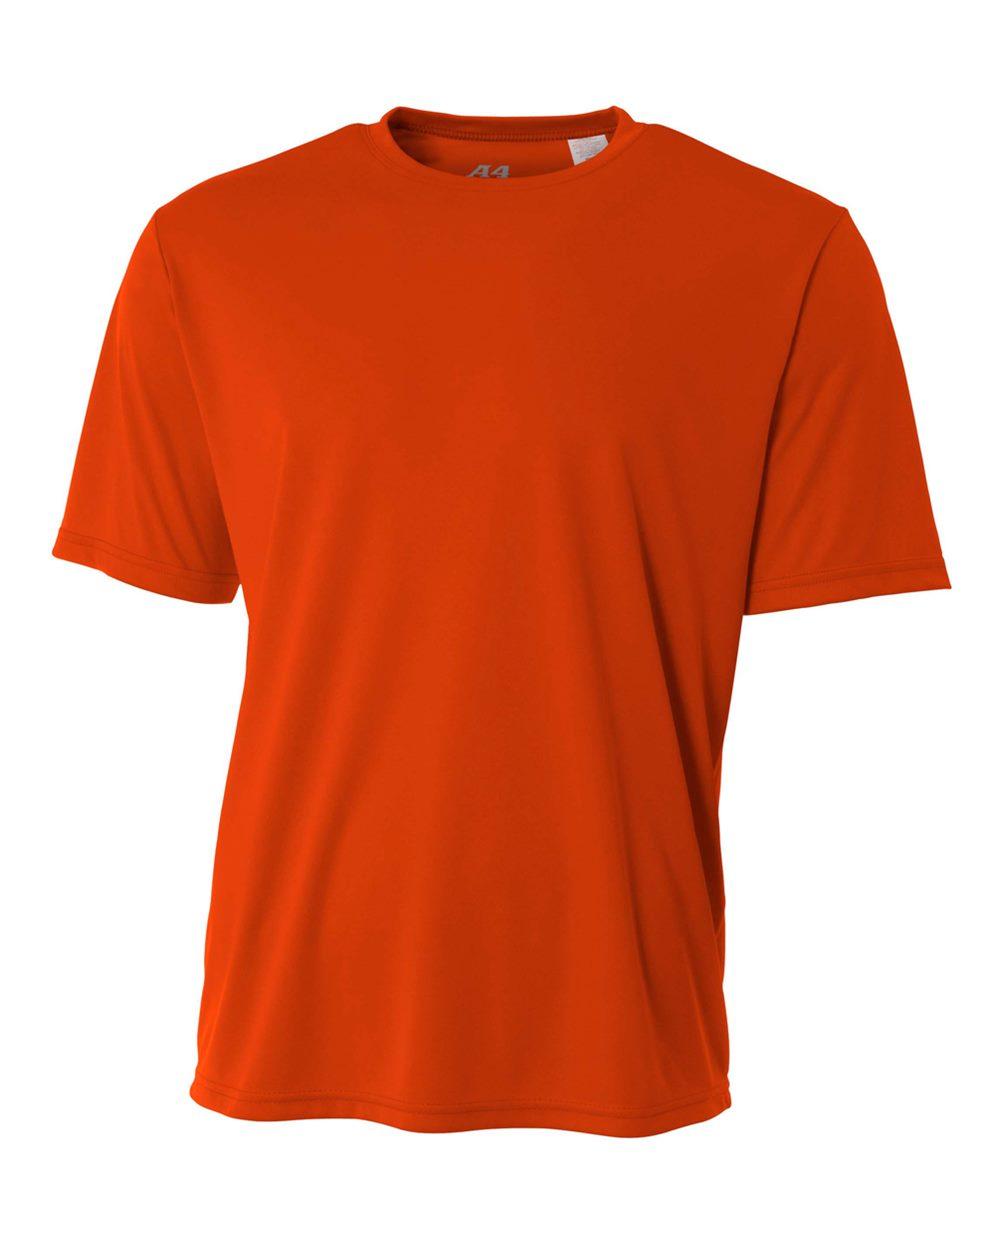 mw-polo-athletic-orange.jpg